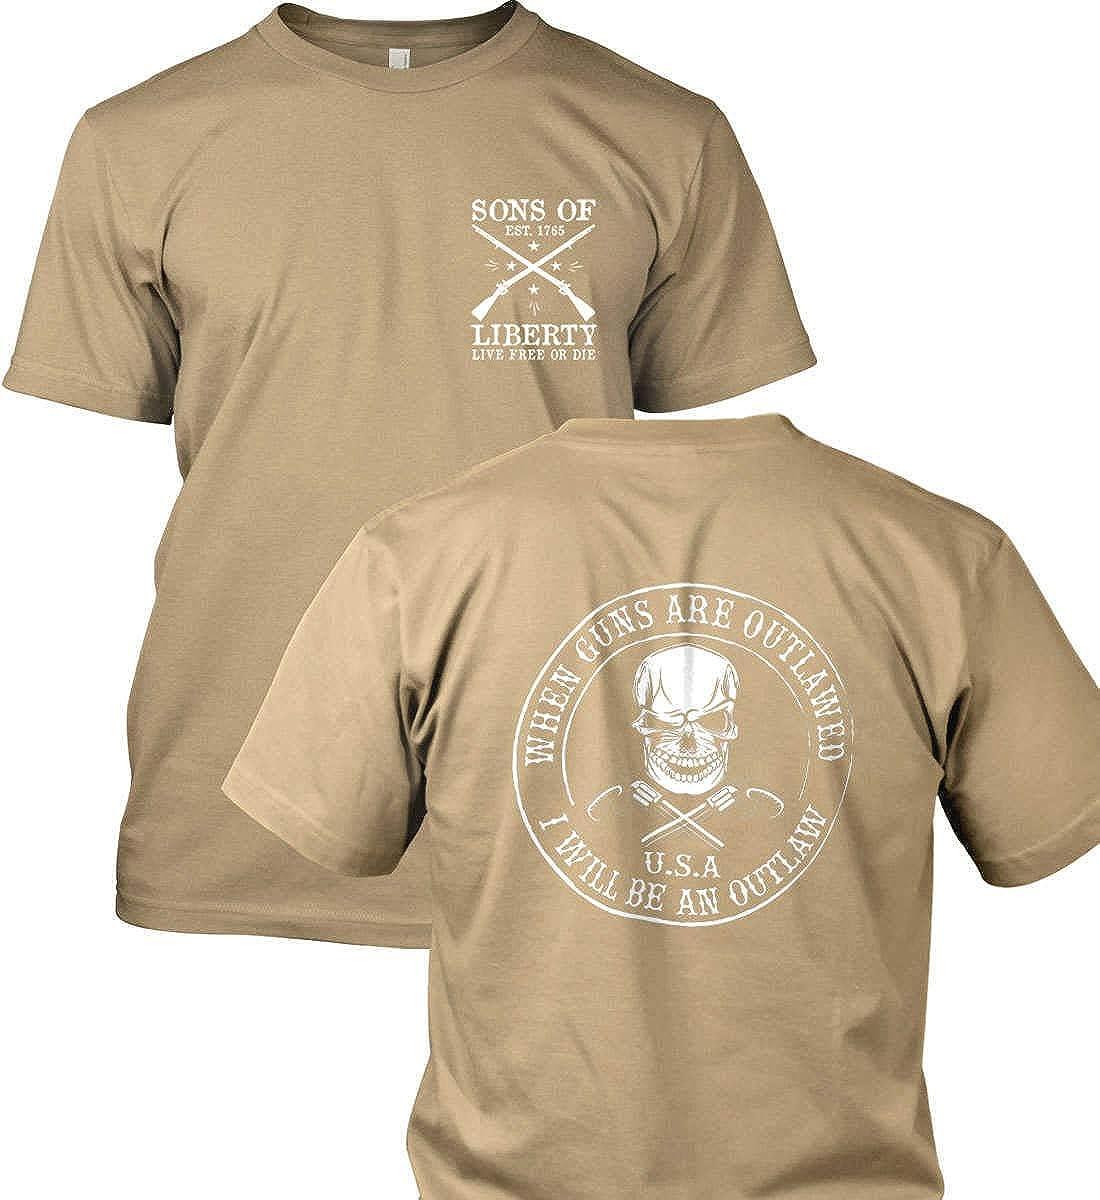 I Will be an Outlaw When Guns are Outlawed Gildan T-Shirt